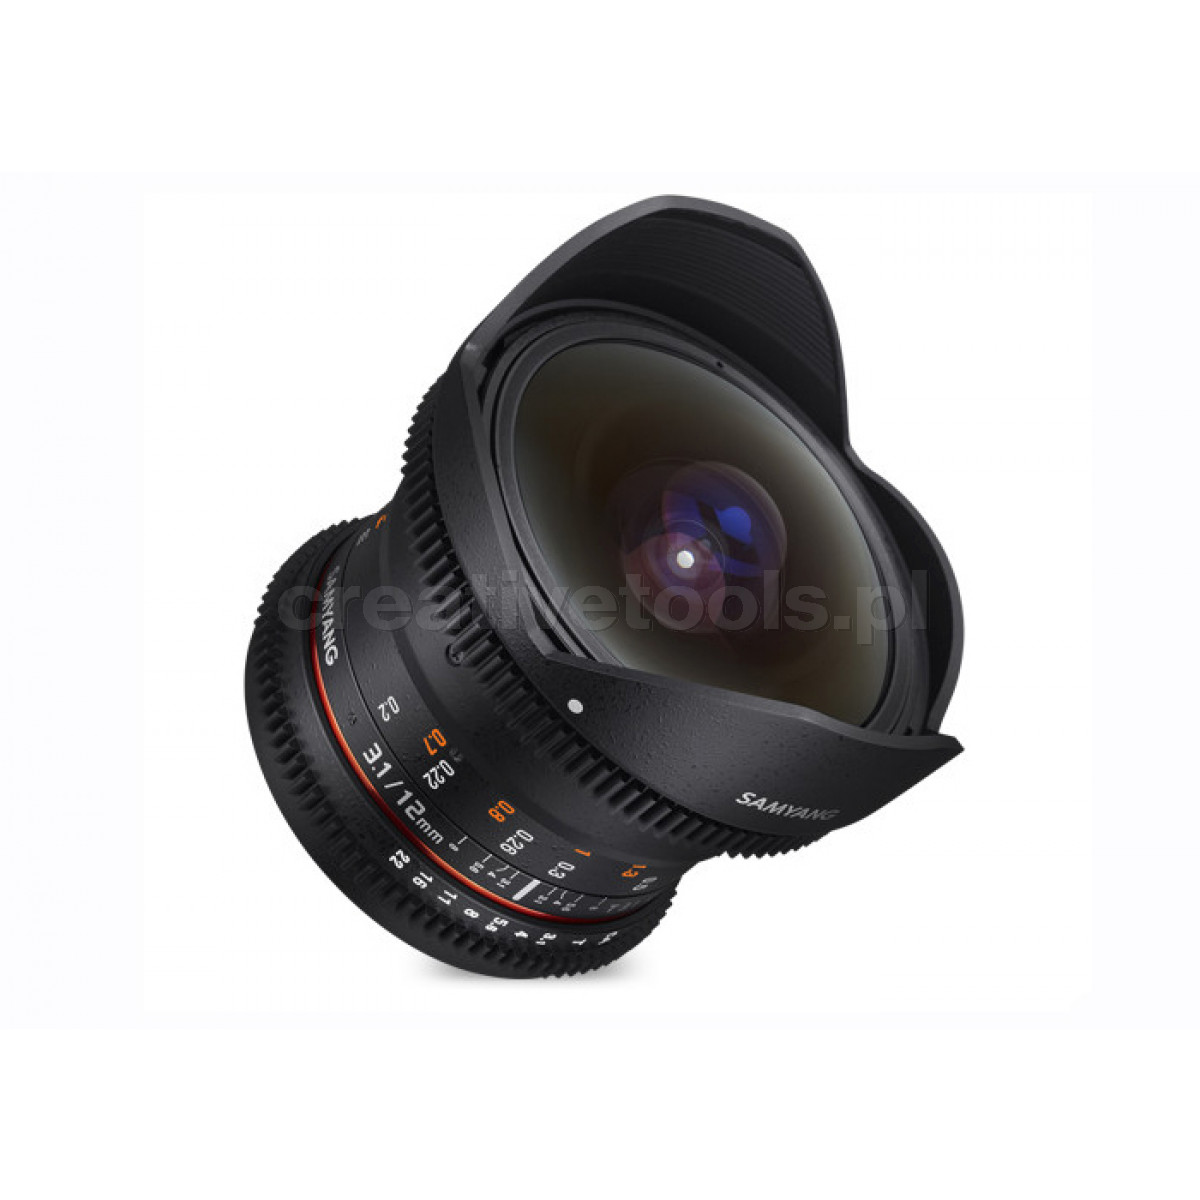 Samyang XP 10mm F3.5 Nikon F Premium Mf Lens By Studio